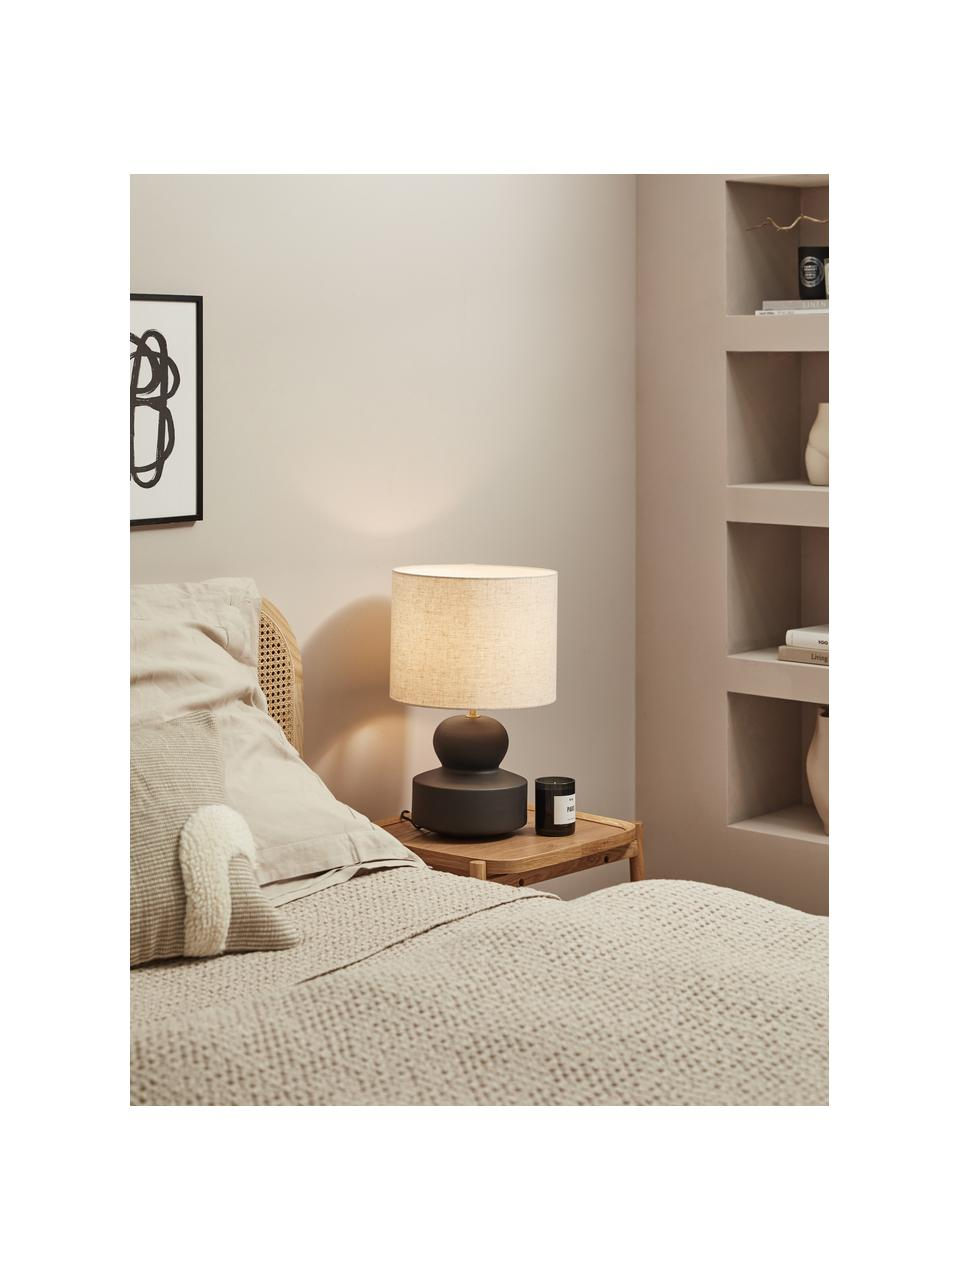 Große Keramik-Tischlampe Georgina, Lampenschirm: Textil, Lampenfuß: Keramik, Dekor: Metall, vermessingt, Beige, Schwarz, Ø 33 x H 52 cm